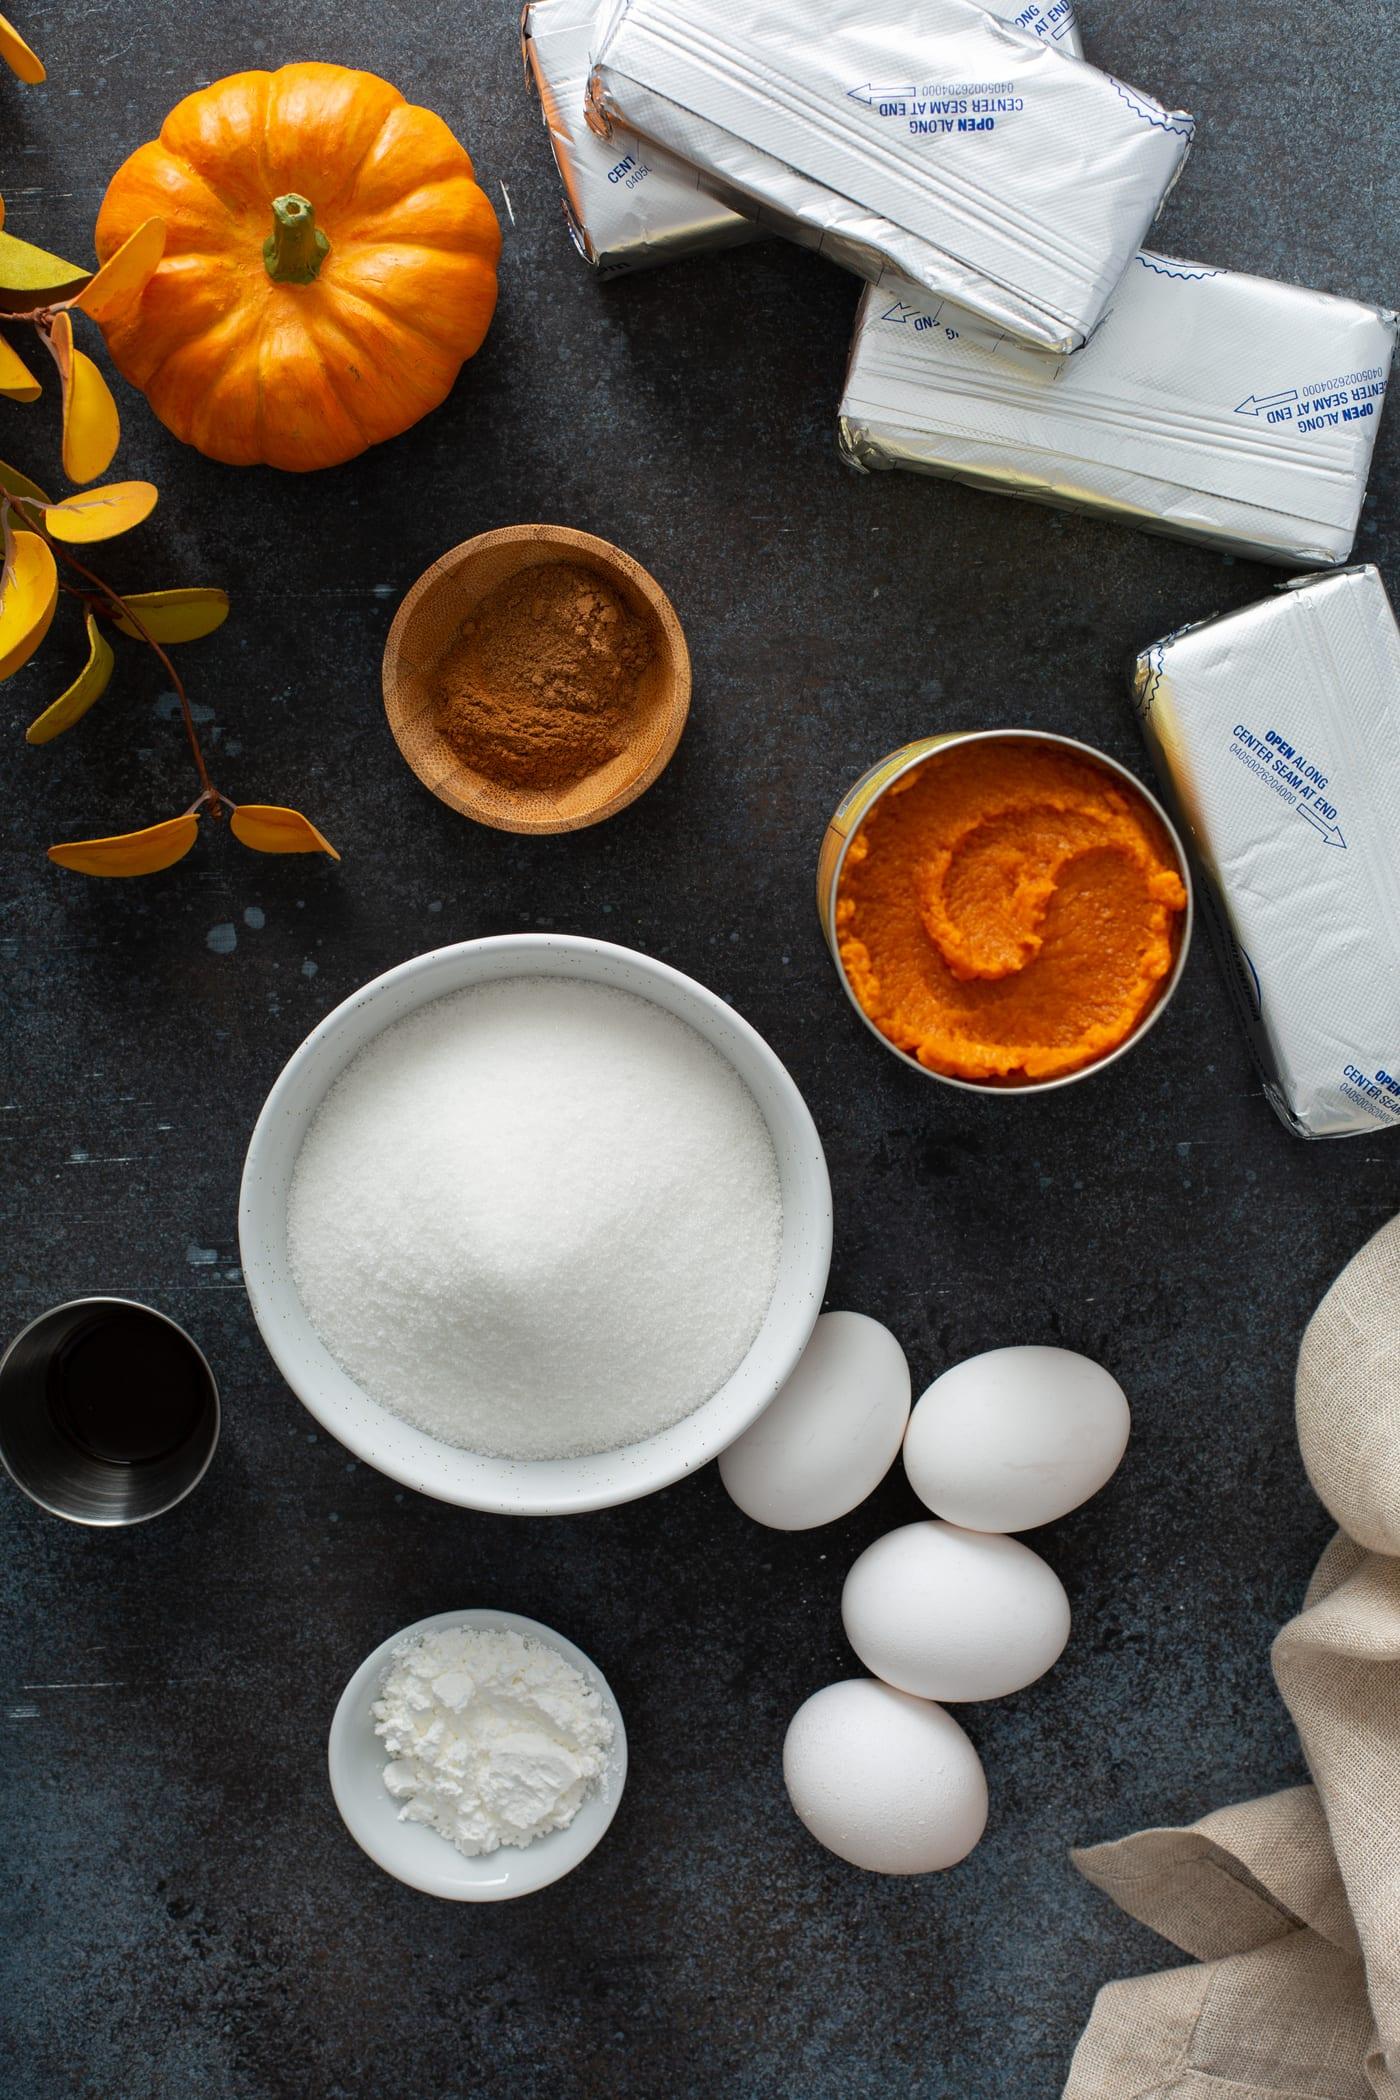 Ingredients for swirled pumpkin cheesecake. There is sugar, eggs, pumpkin, cinnamon, cream cheese, and vanilla.